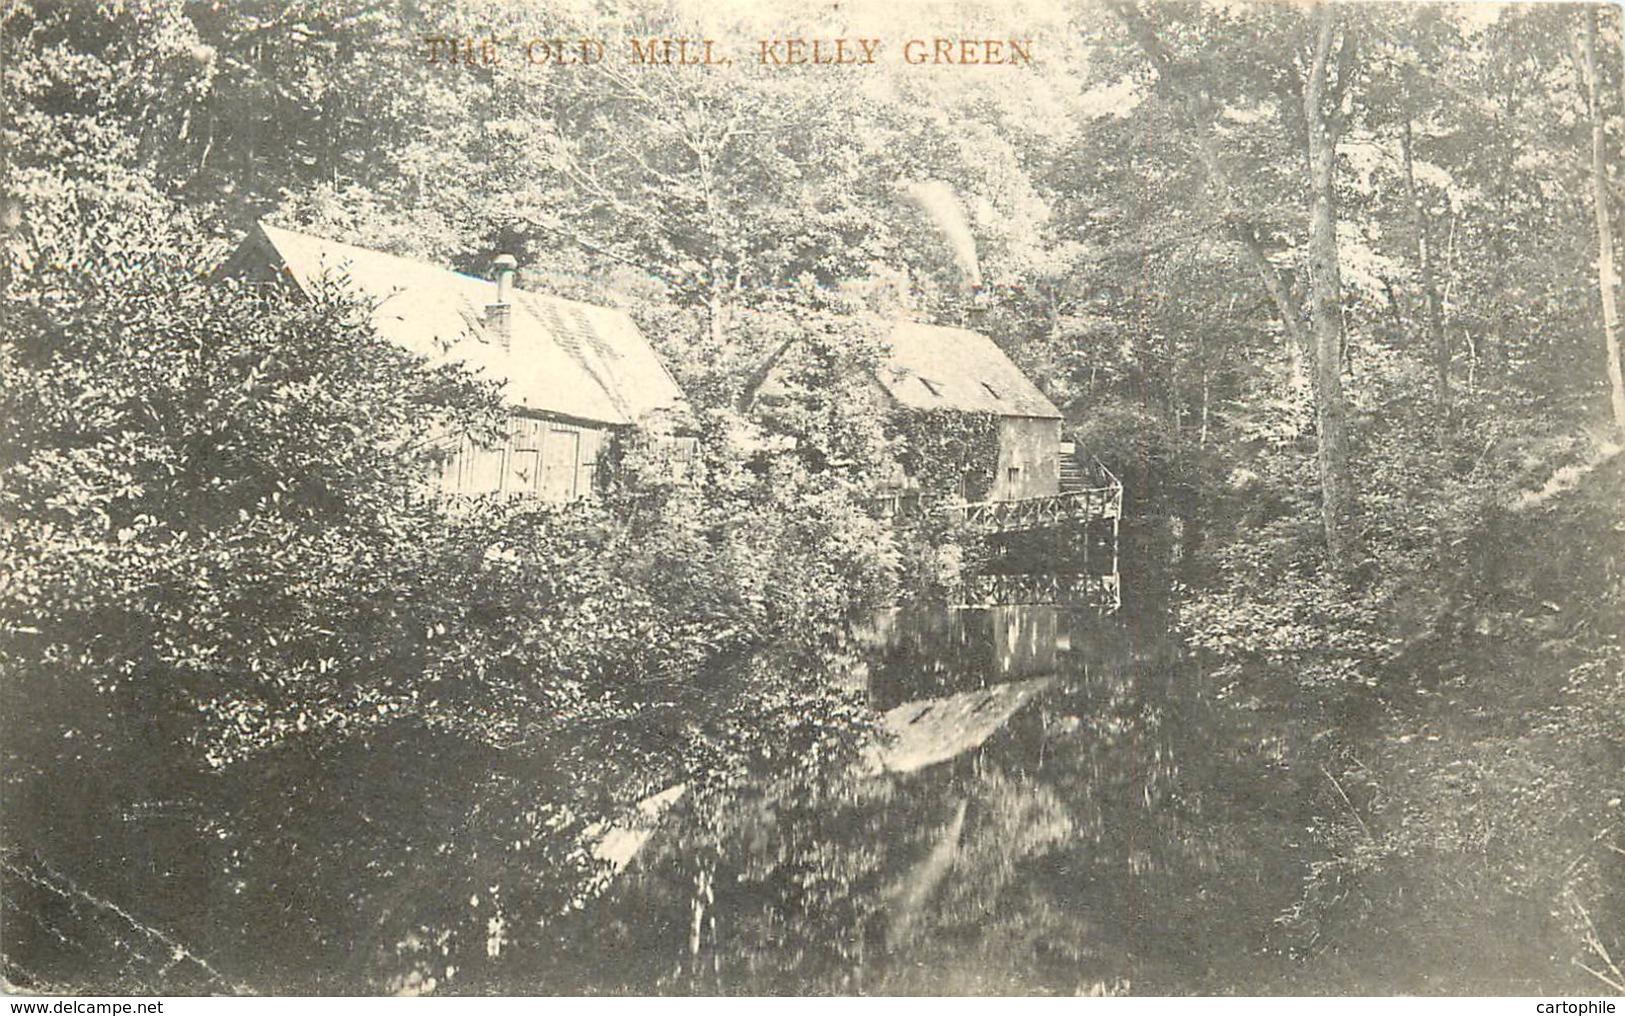 UK - Scotland - Ayrshire - The Old Mill Kelly Green In 1910 - Ayrshire